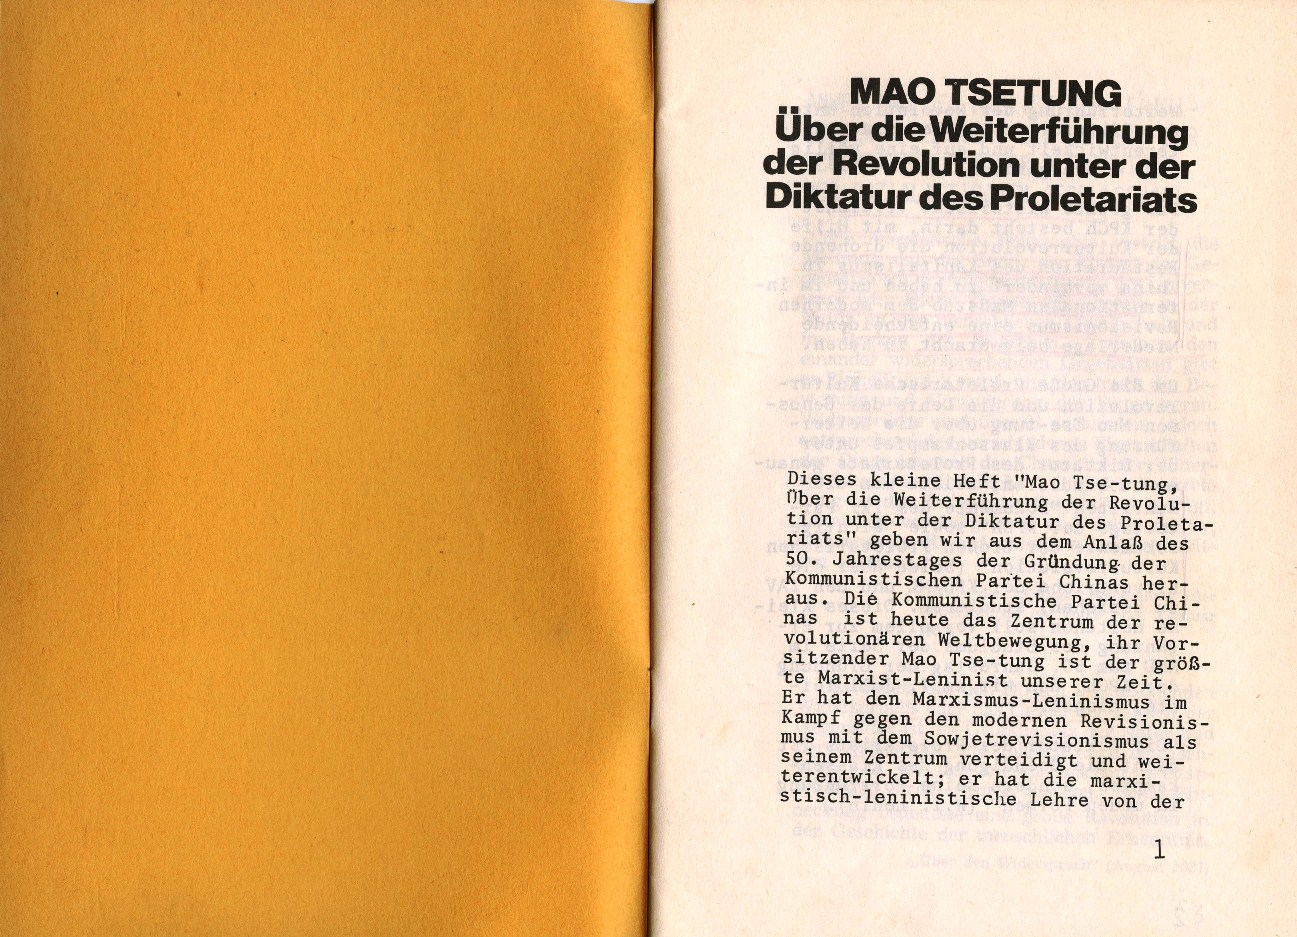 ZB_Mao_Revolutionstheorie_1971_02